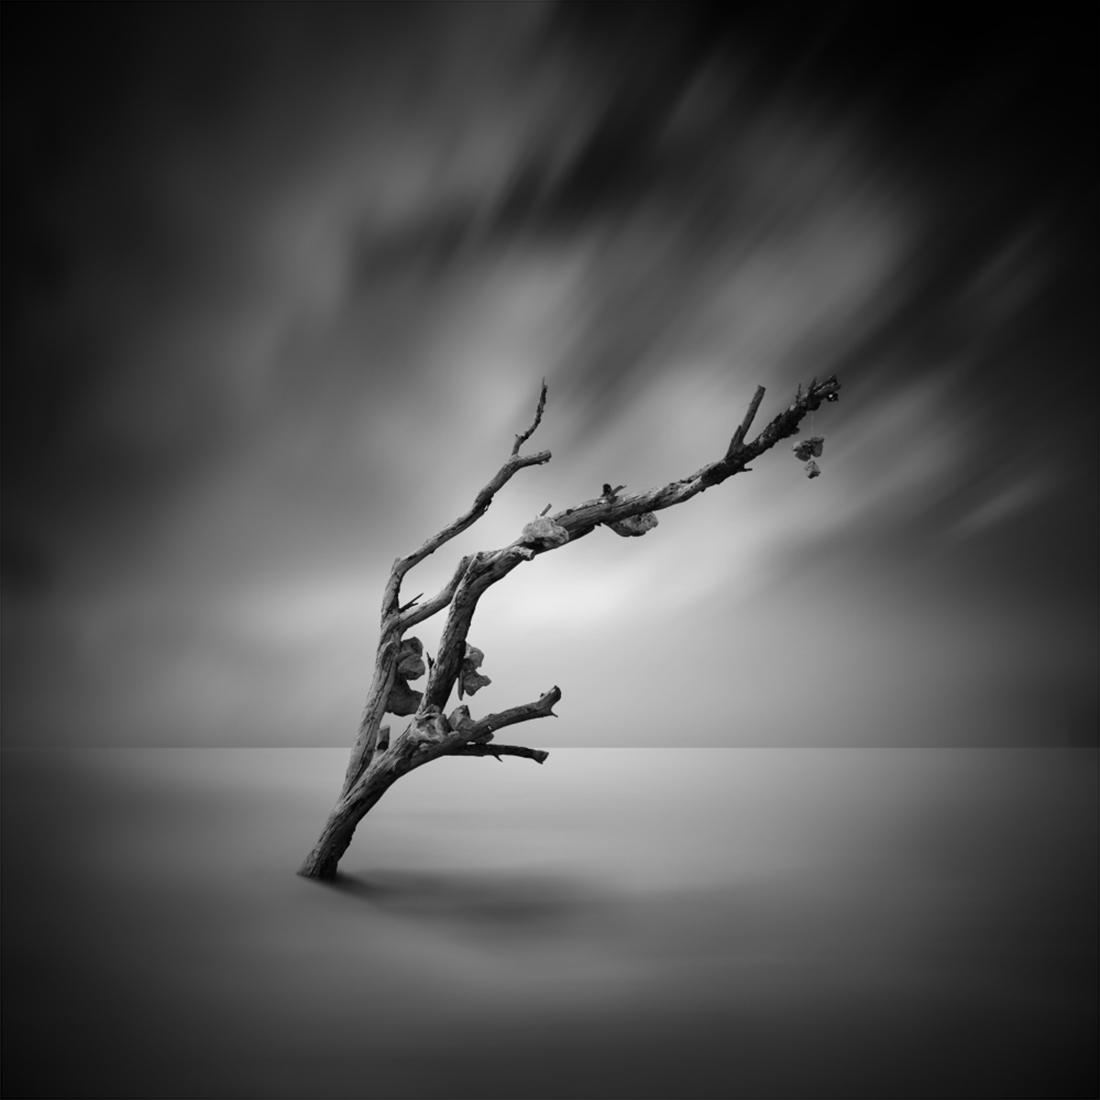 42_Tree of life by Hasibe Borhani (10).jpg